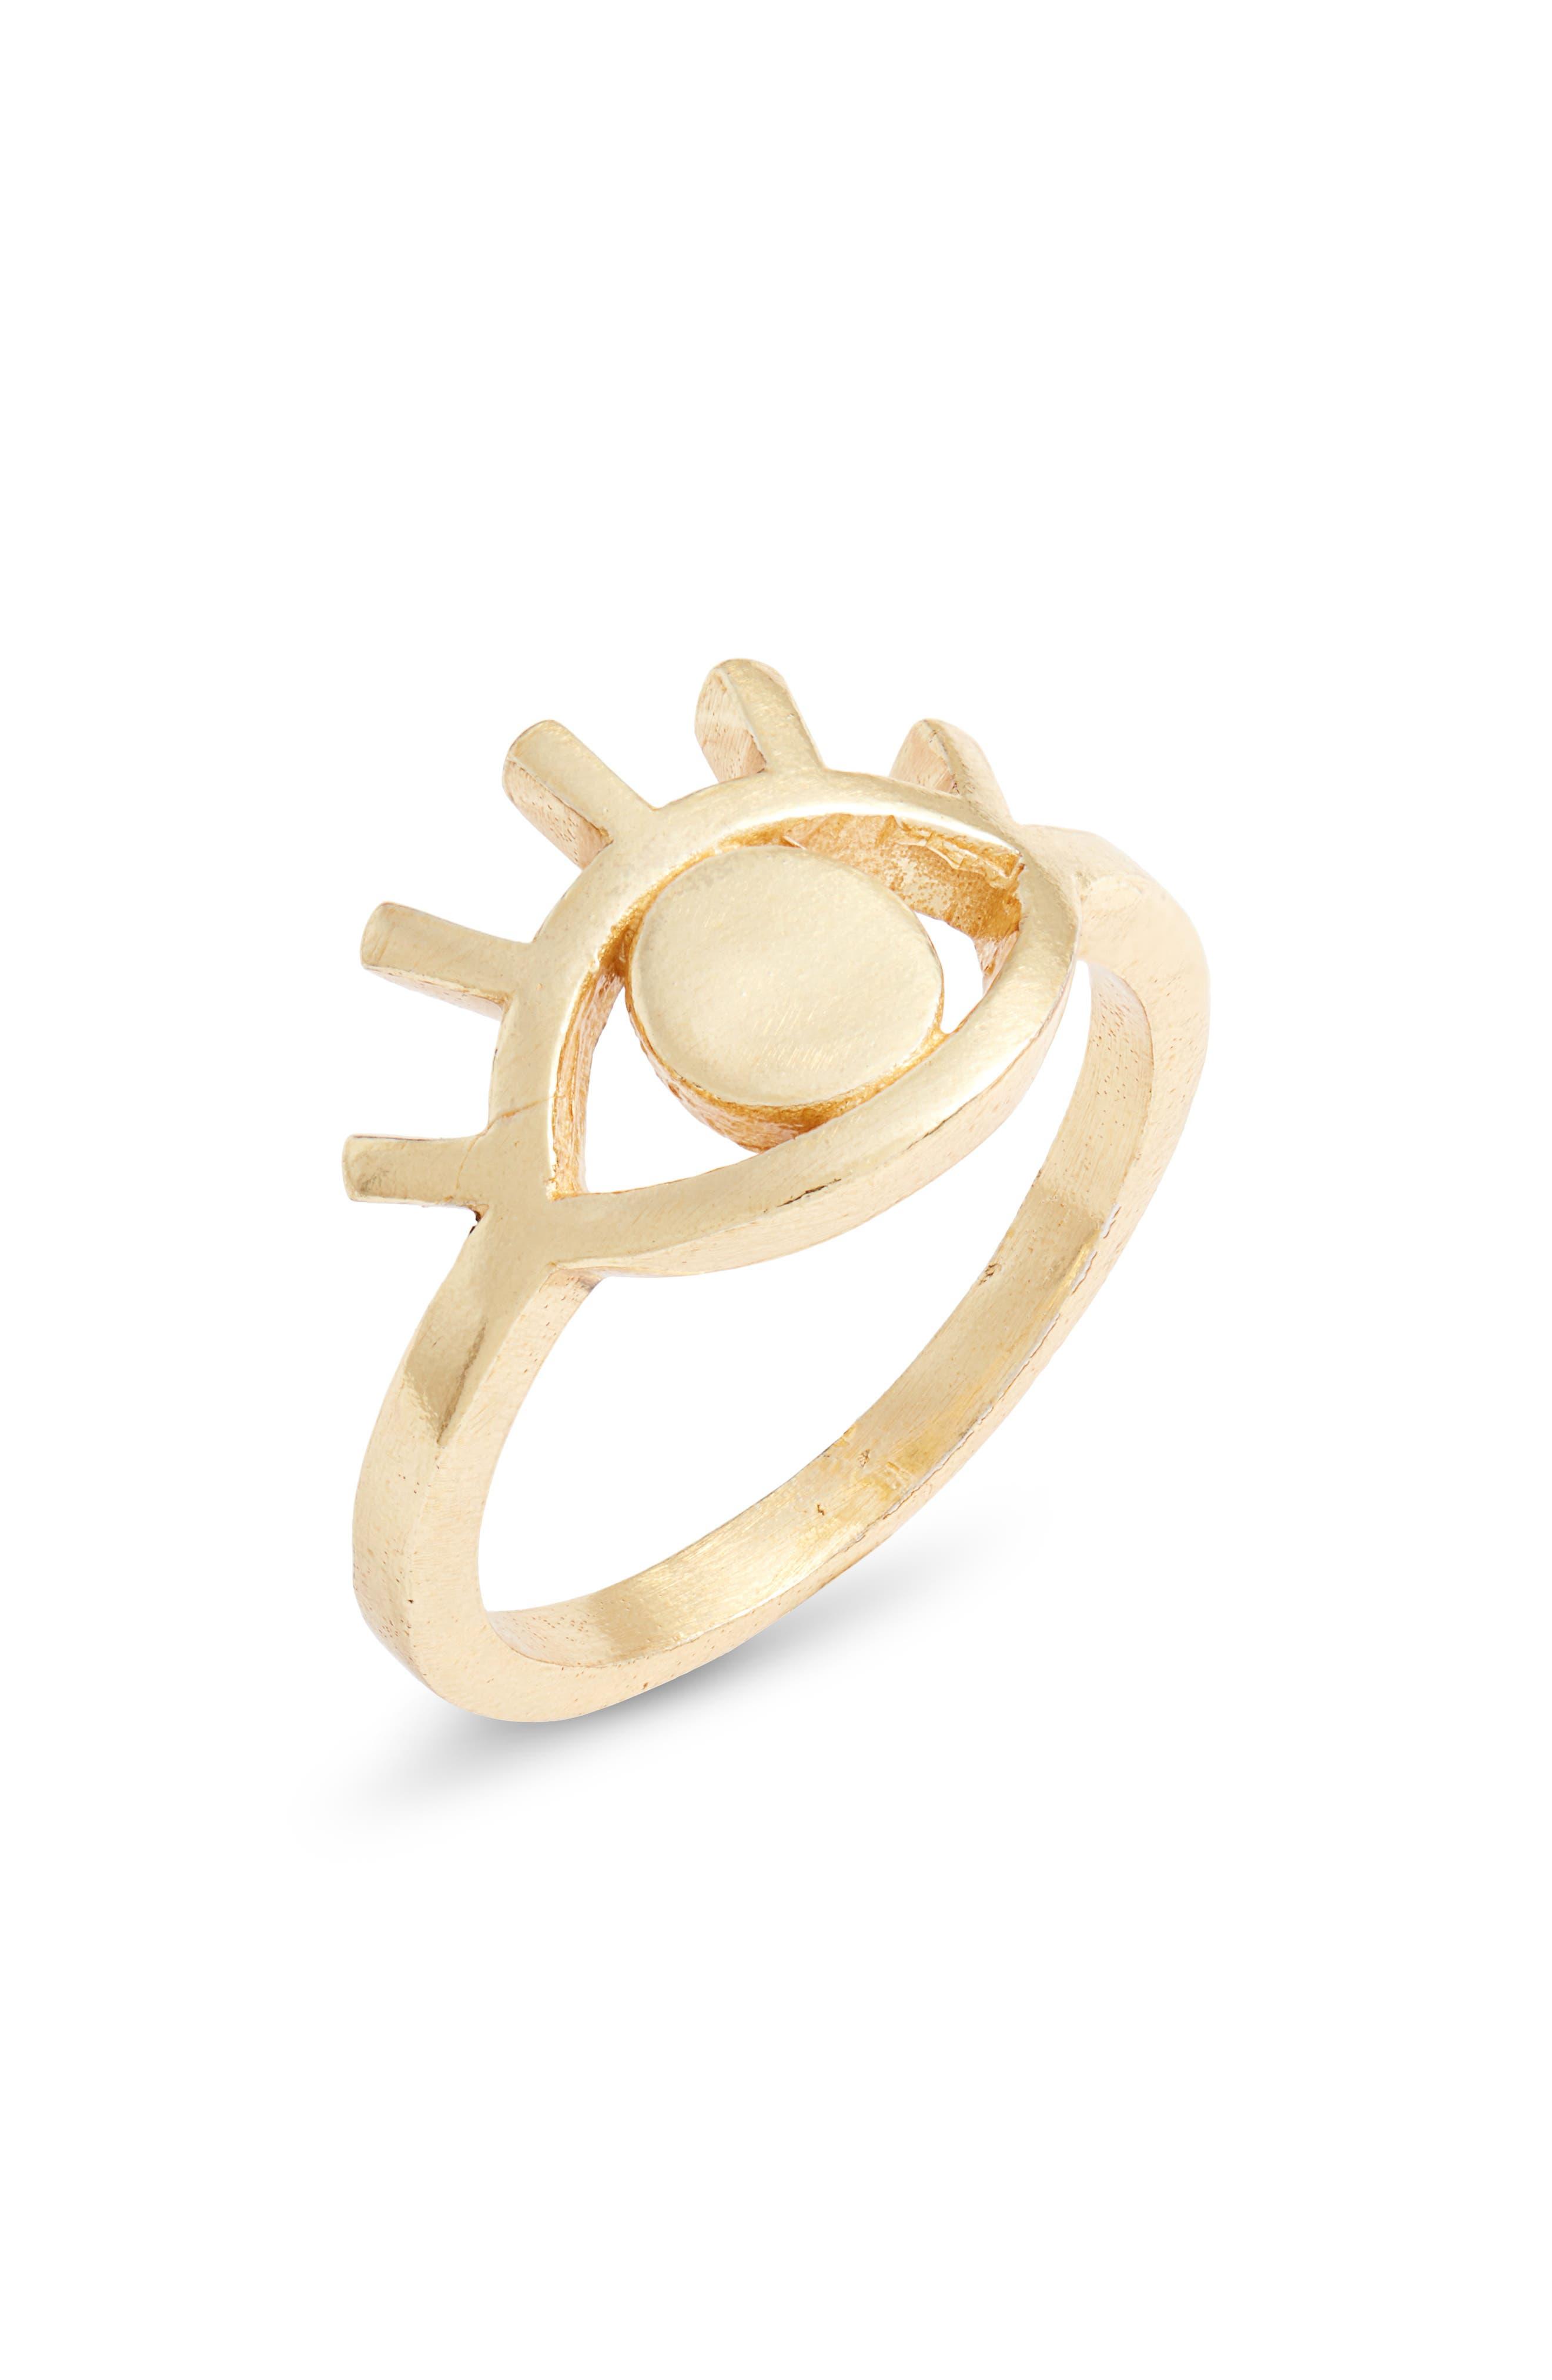 Joan Sterling Silver Ring